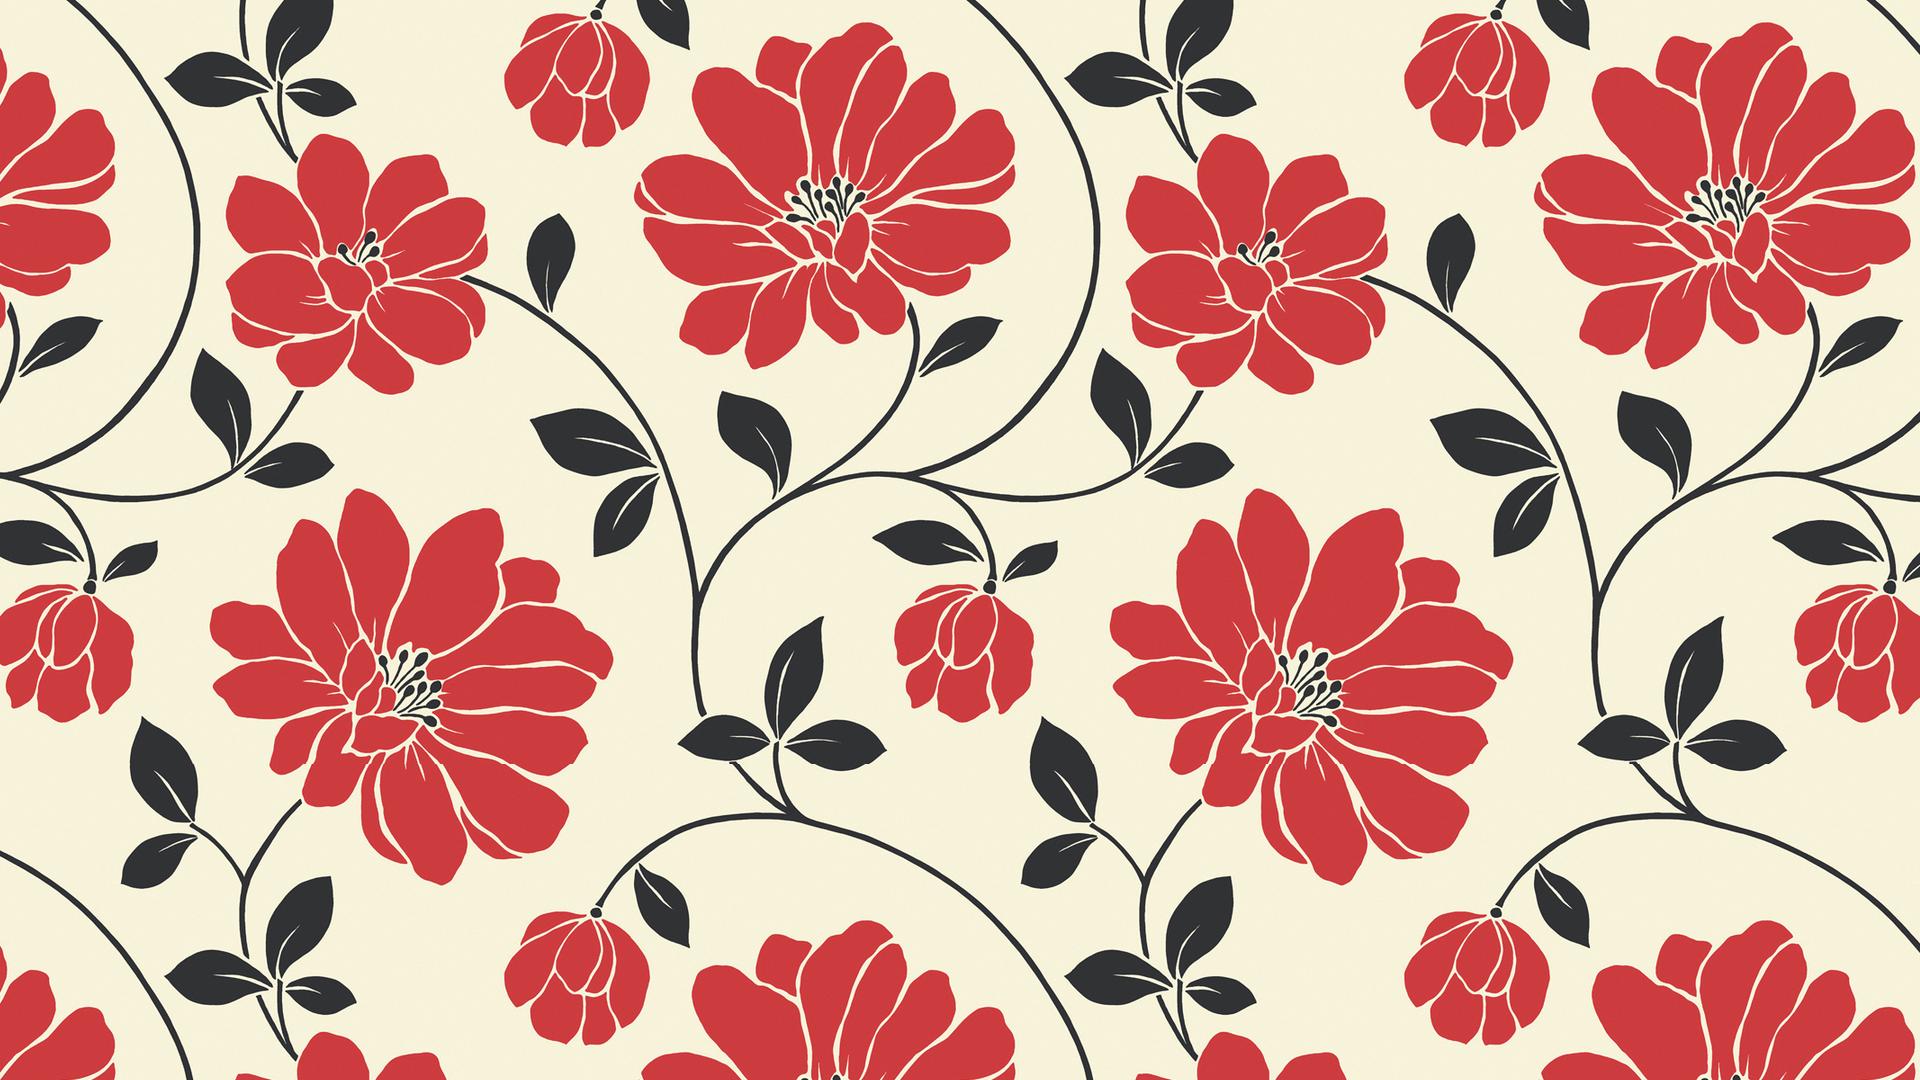 Flower-Tumblr-Backgrounds-Images-Art-Photos-wallpaper-wpc5804877